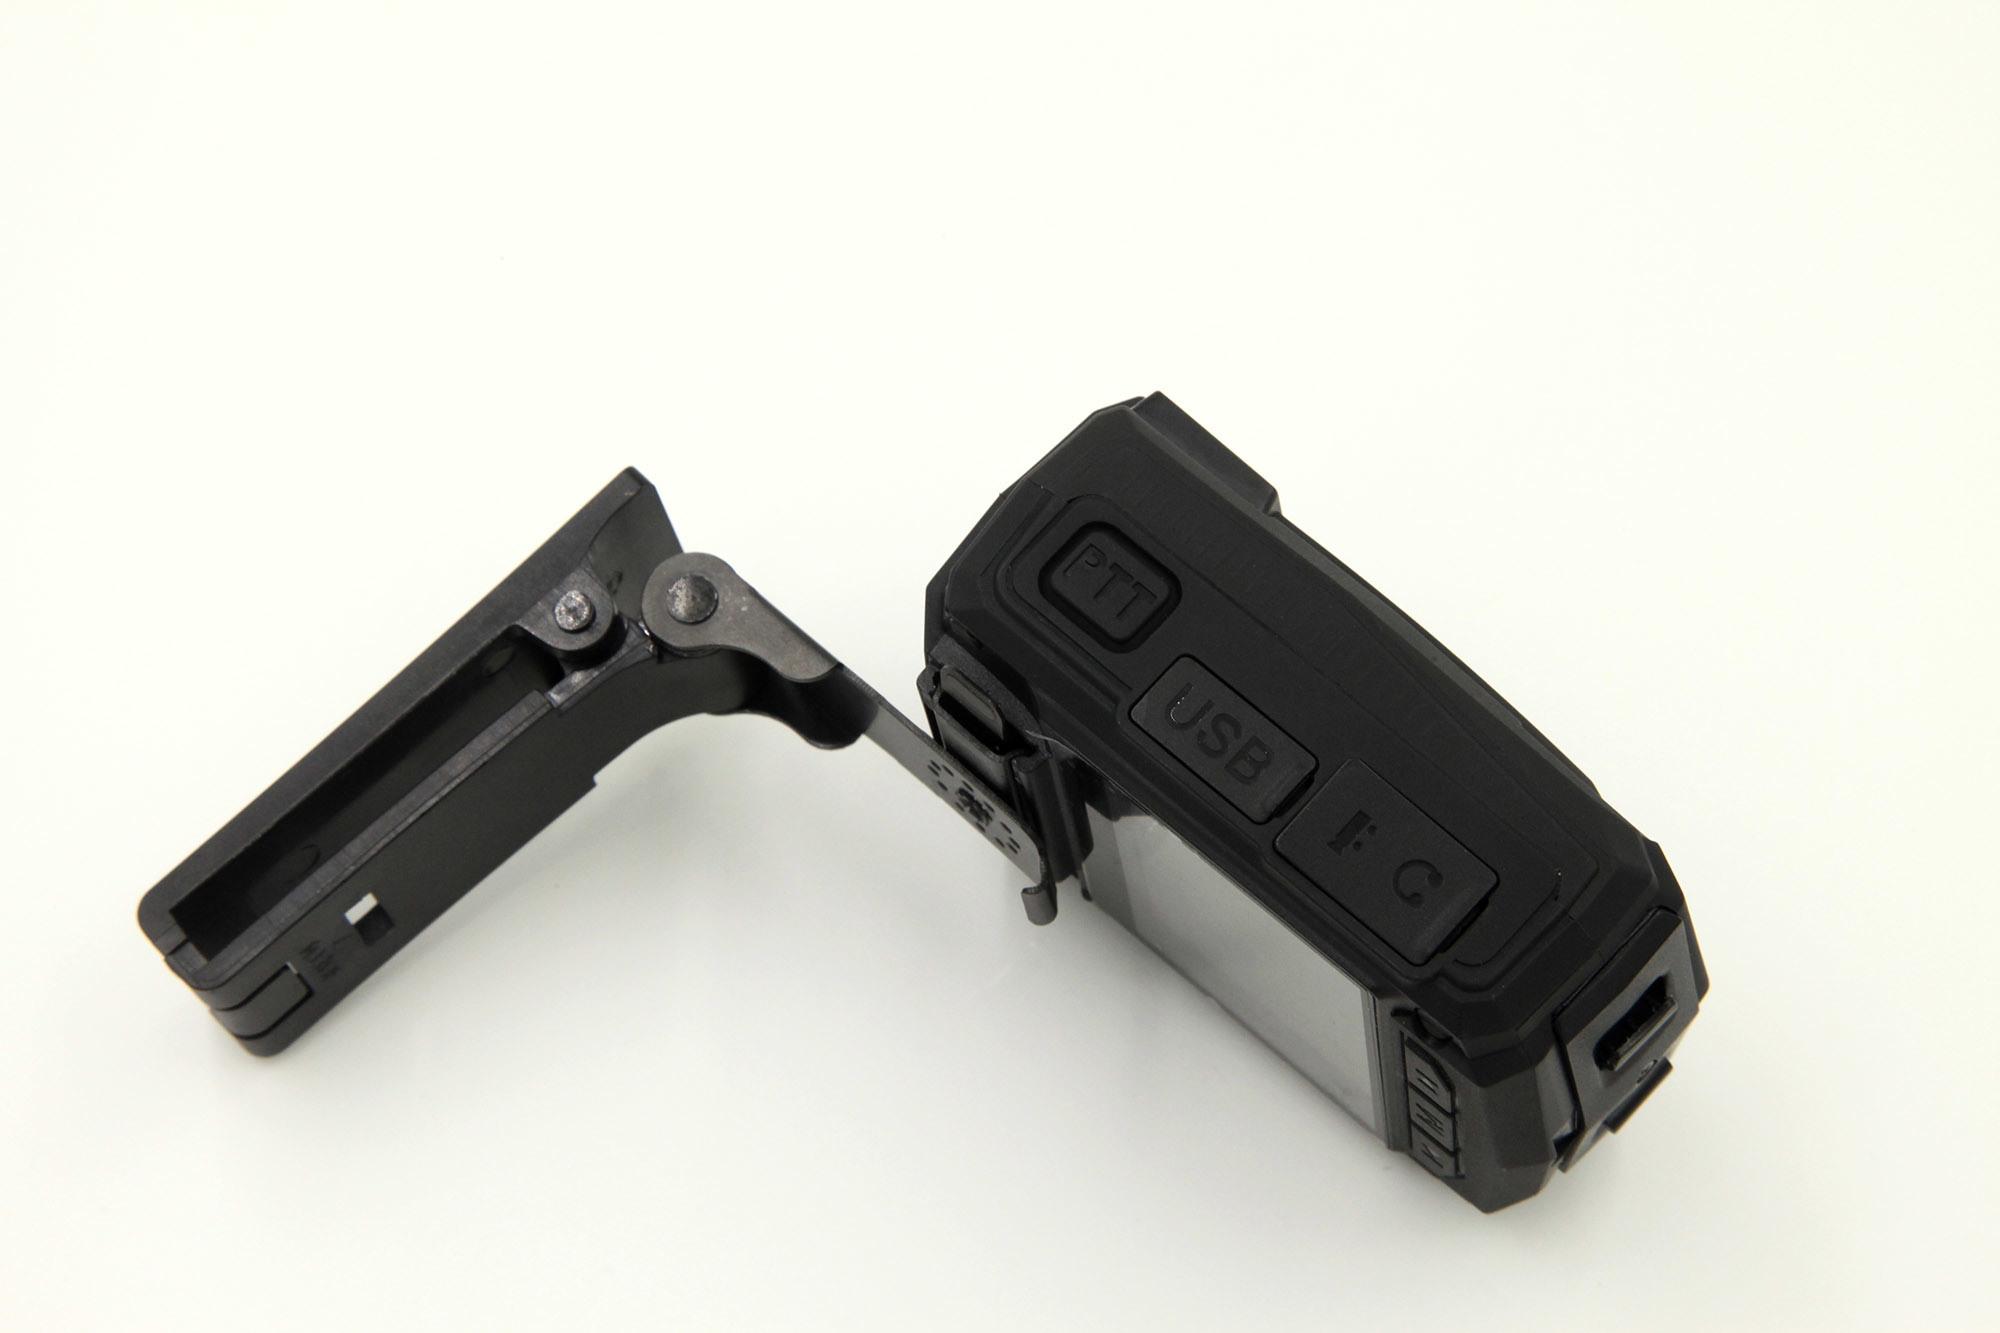 1080P IP67 64G IR Police Worn Body Camera with WiFi Function